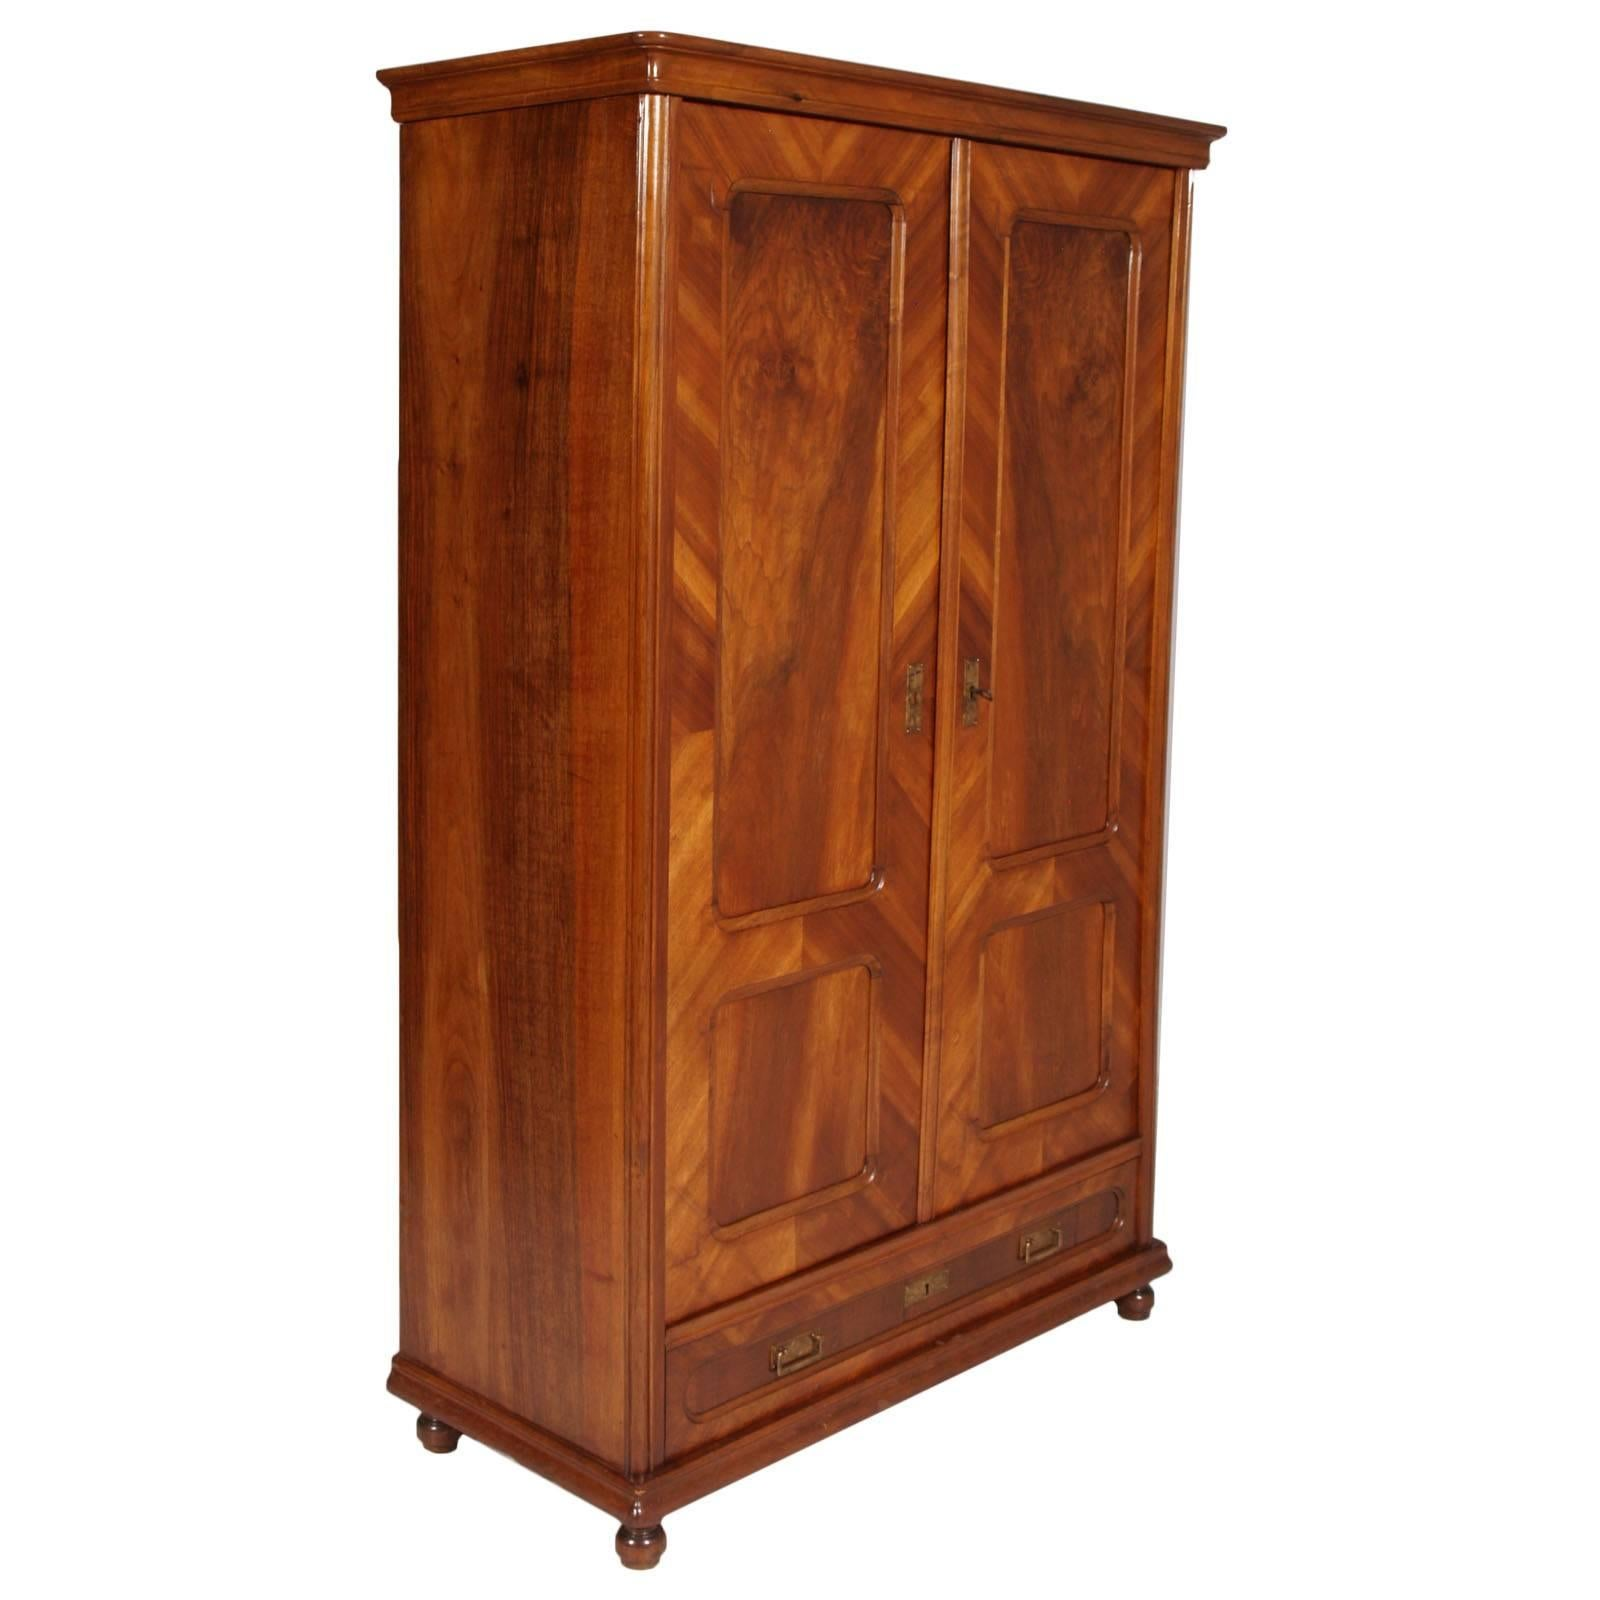 Italian 1850s Louis Philippe armoire or bookcase, blond walnut & veneered walnut